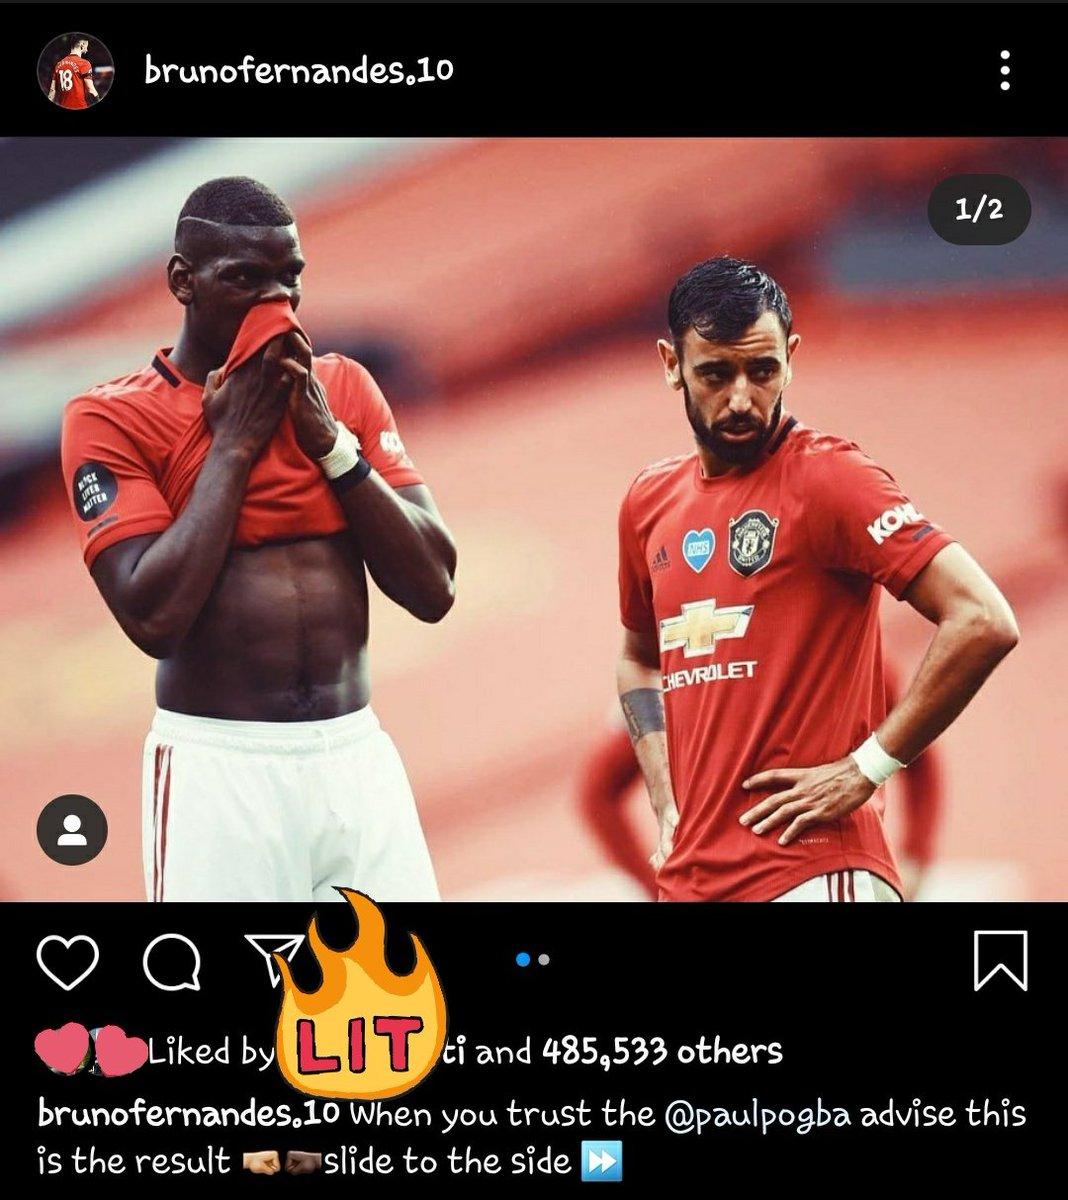 Bruno about Pogba  #instagram pic.twitter.com/G2GvbPWZrP